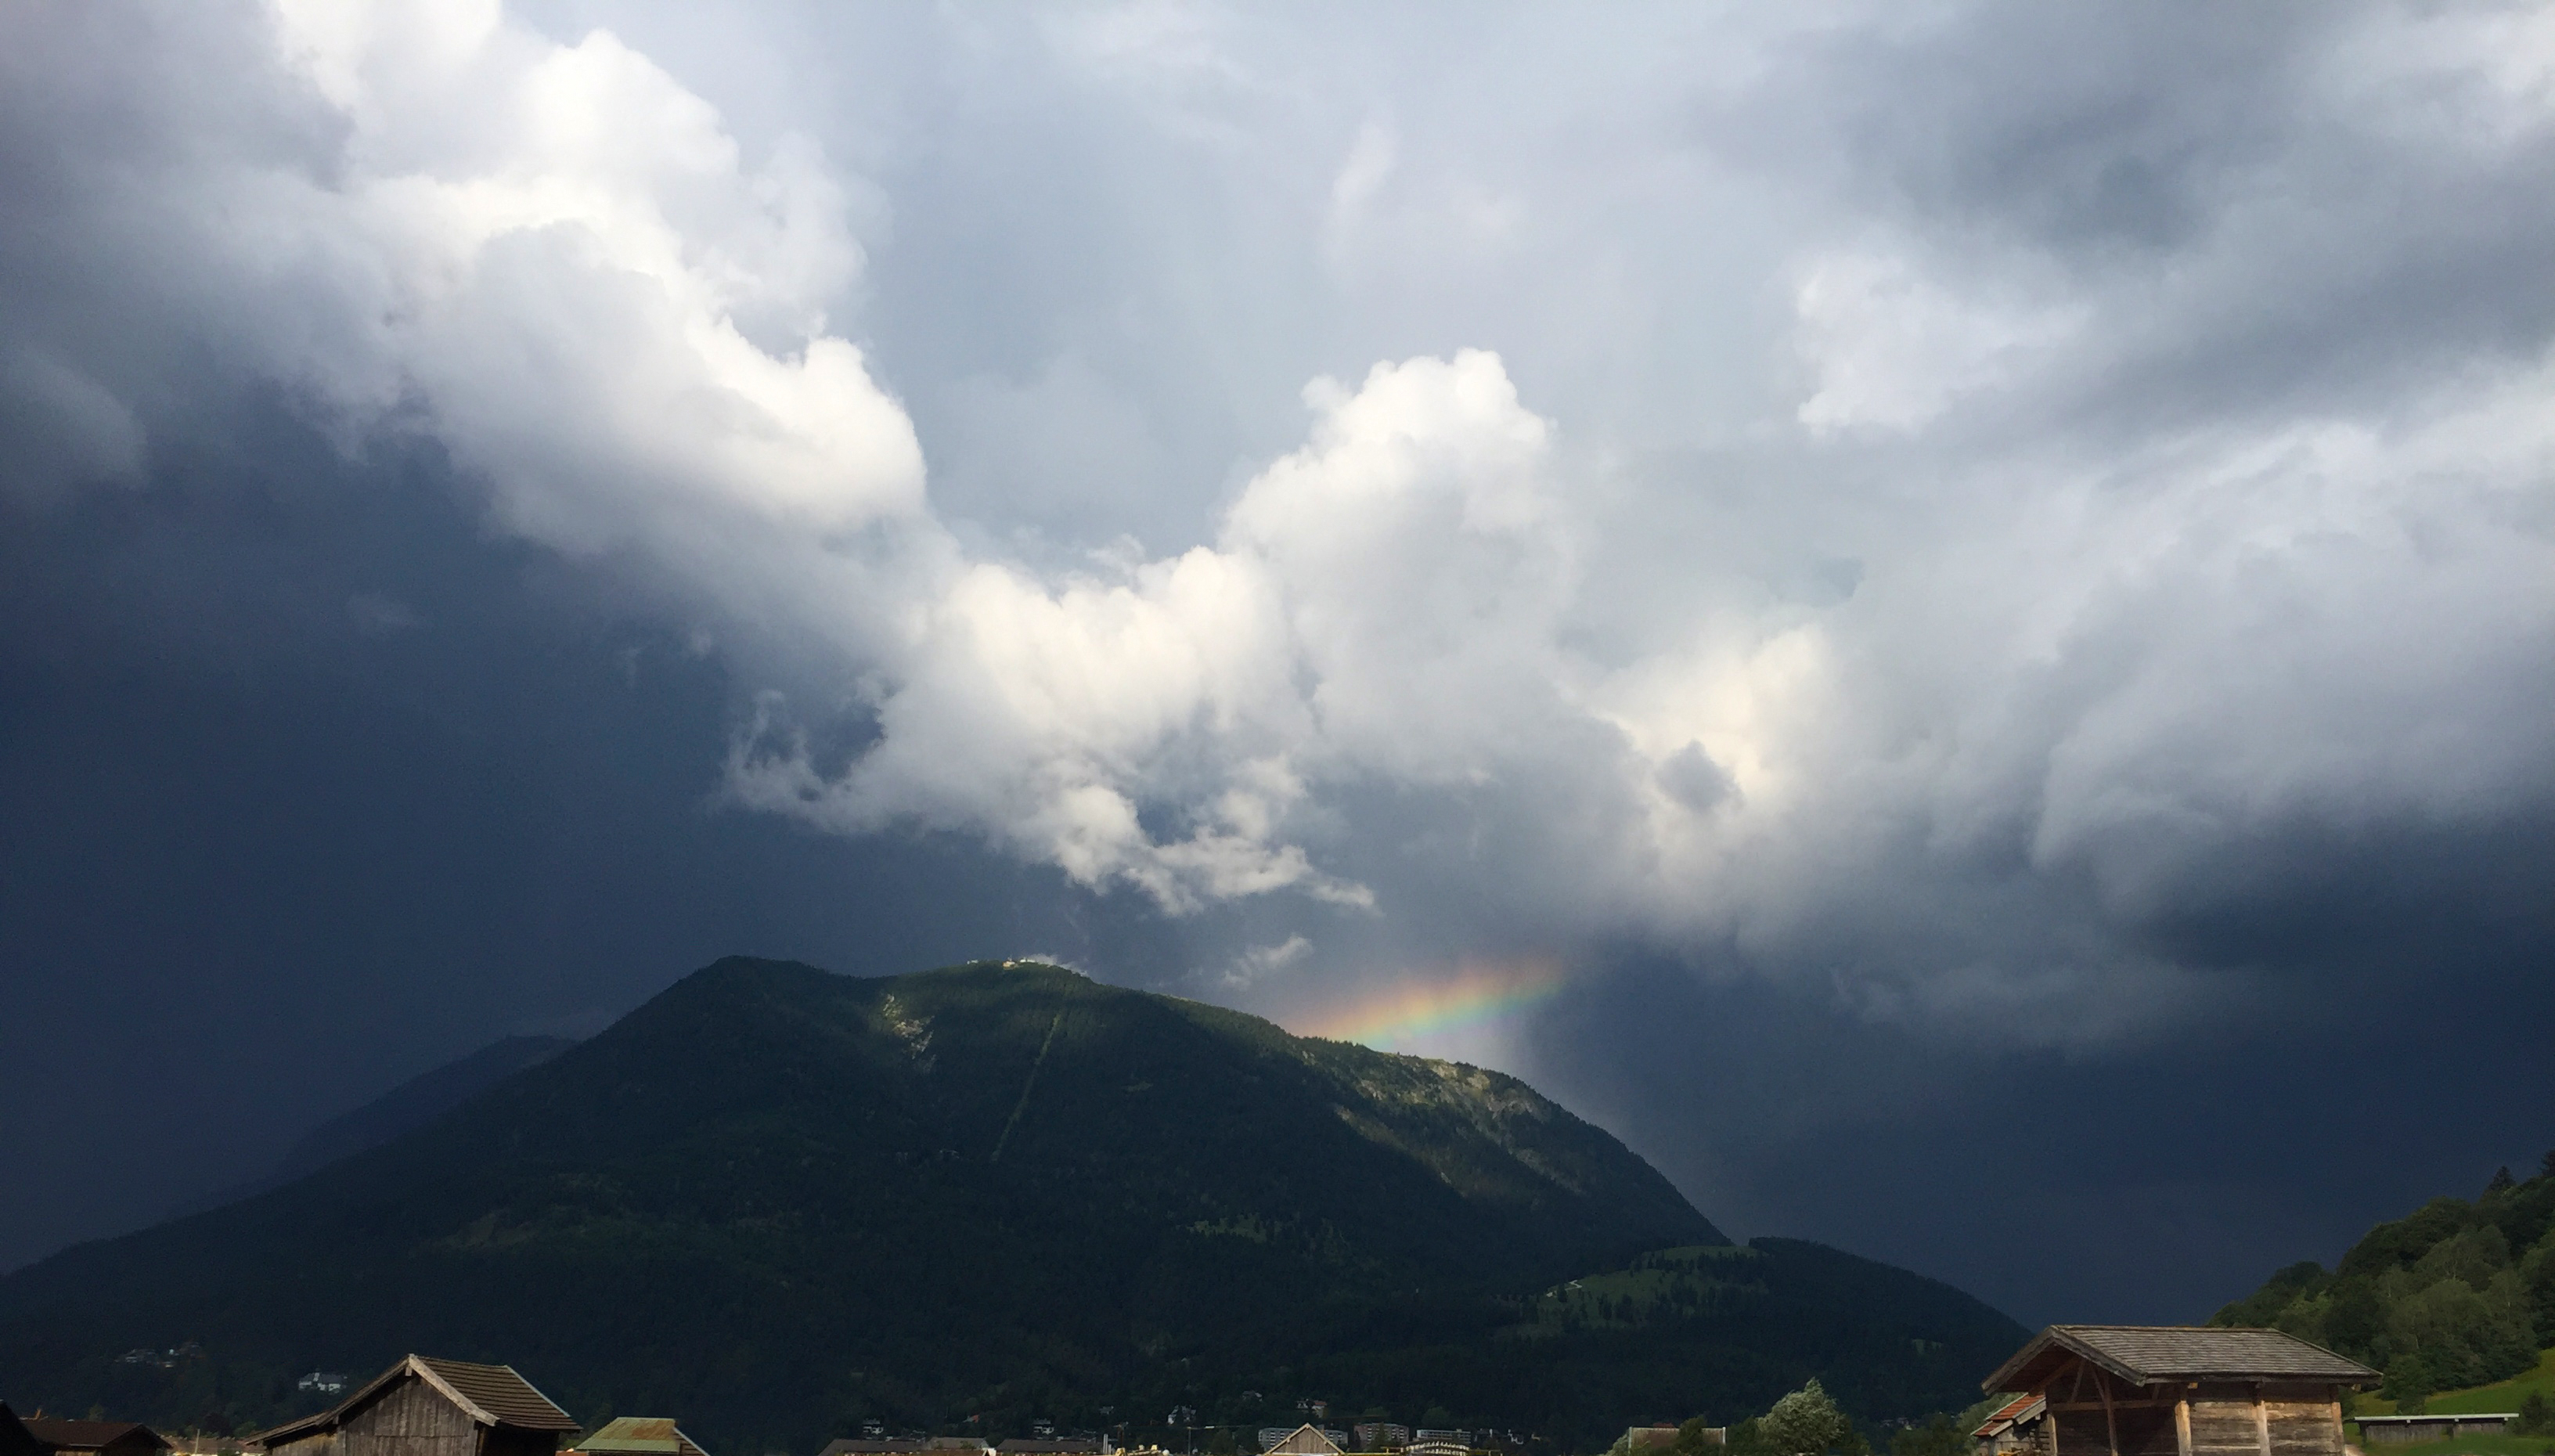 Wank – Gewitter, Donner und Sonne – Thunderstorm, Thunder and sun